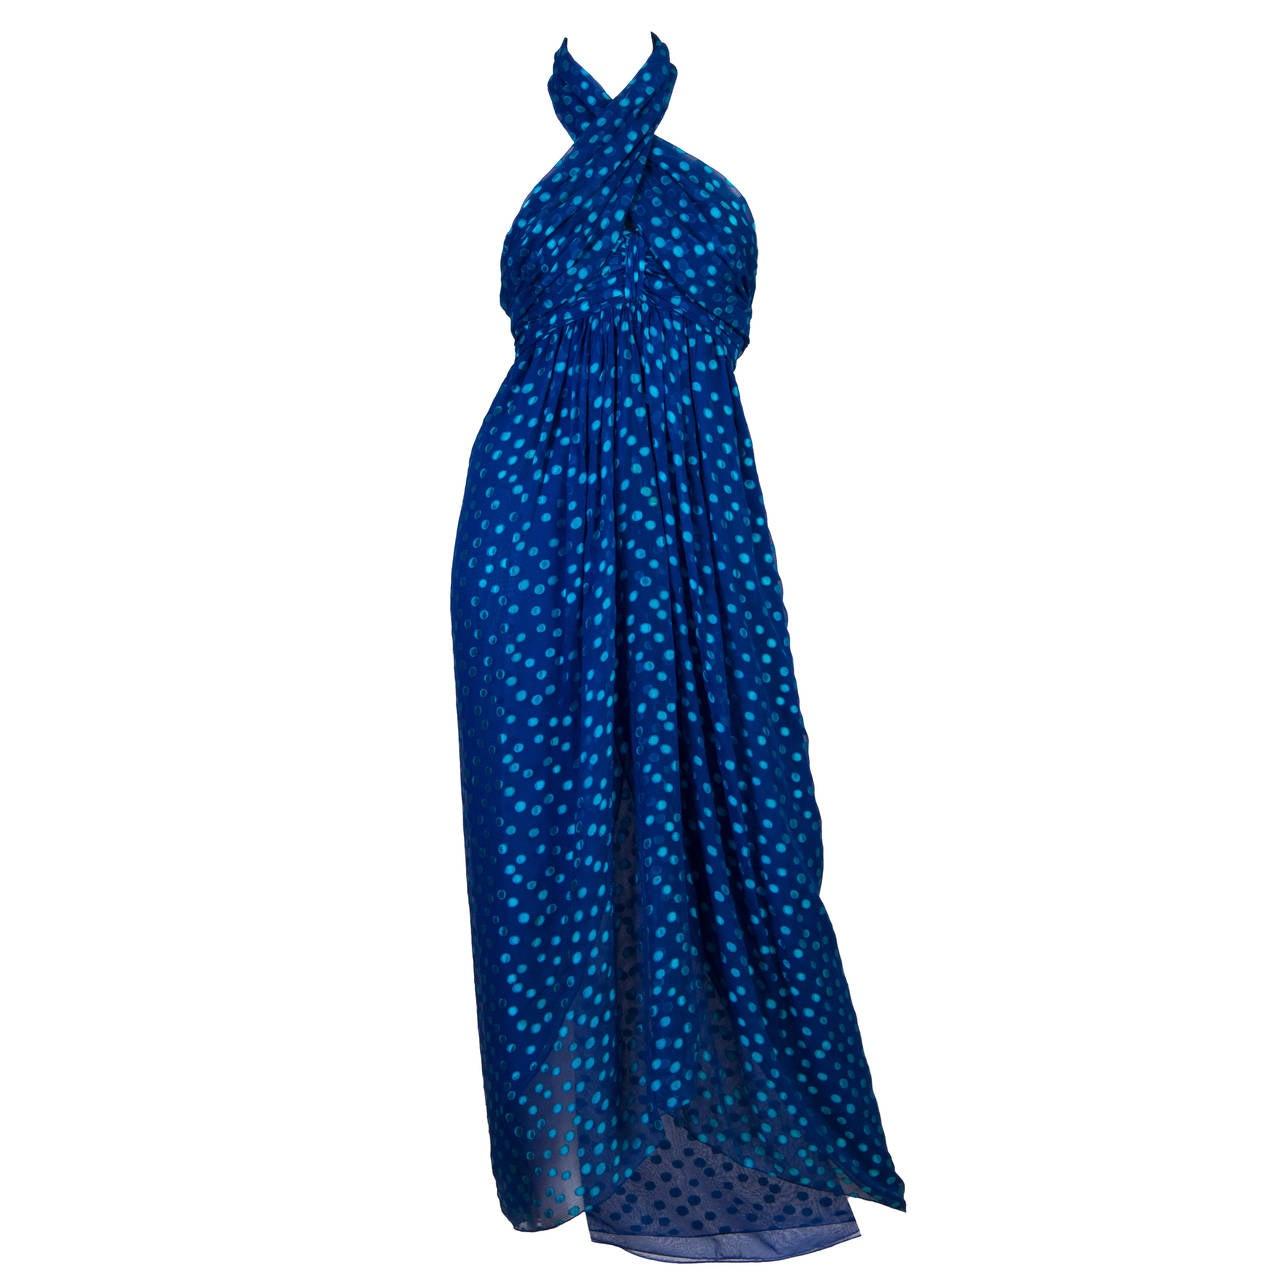 1970s Oscar de la Renta Chiffon Dress